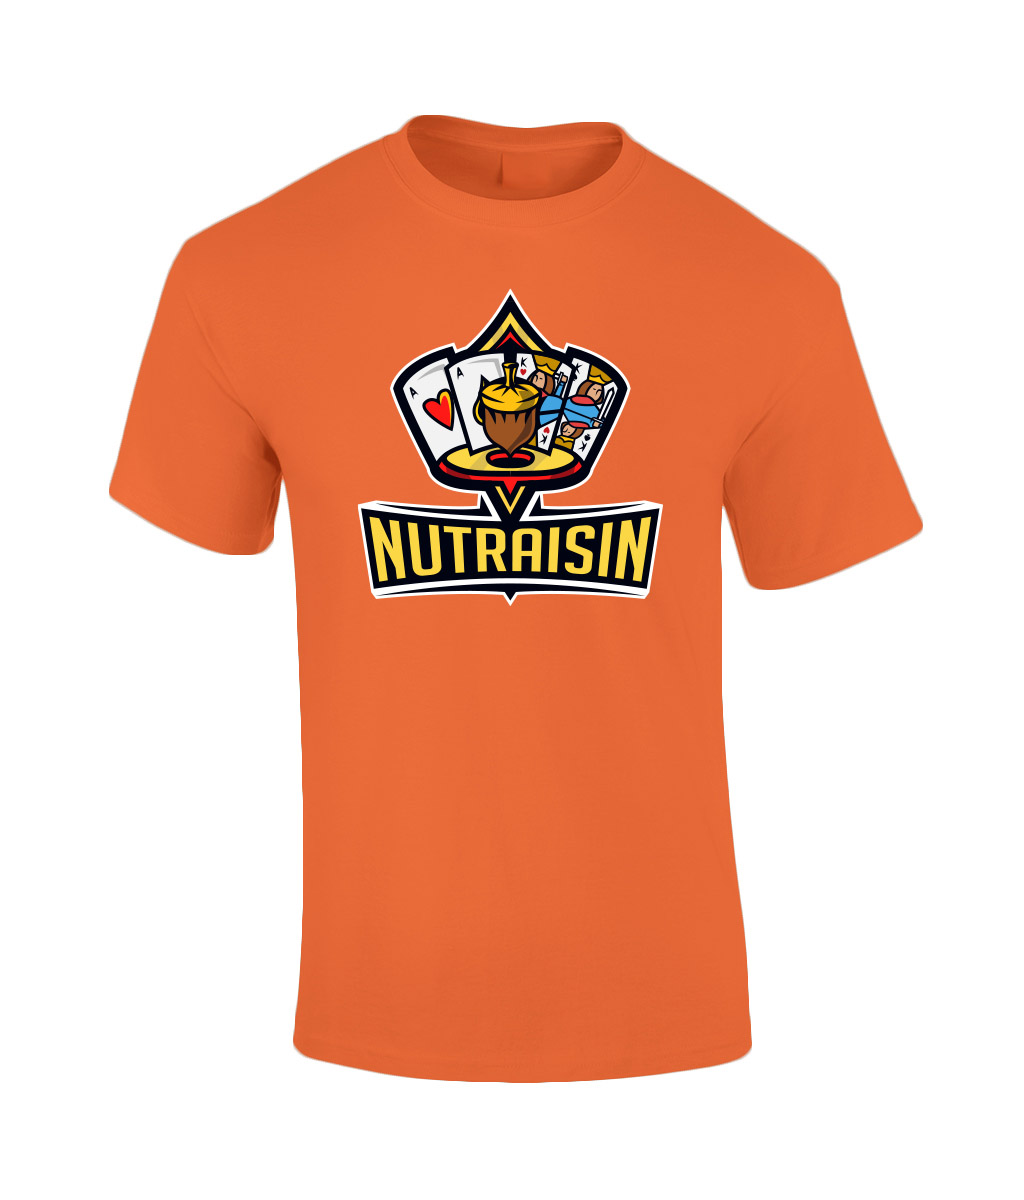 NutRaisin-Unisex-T-Tangerine